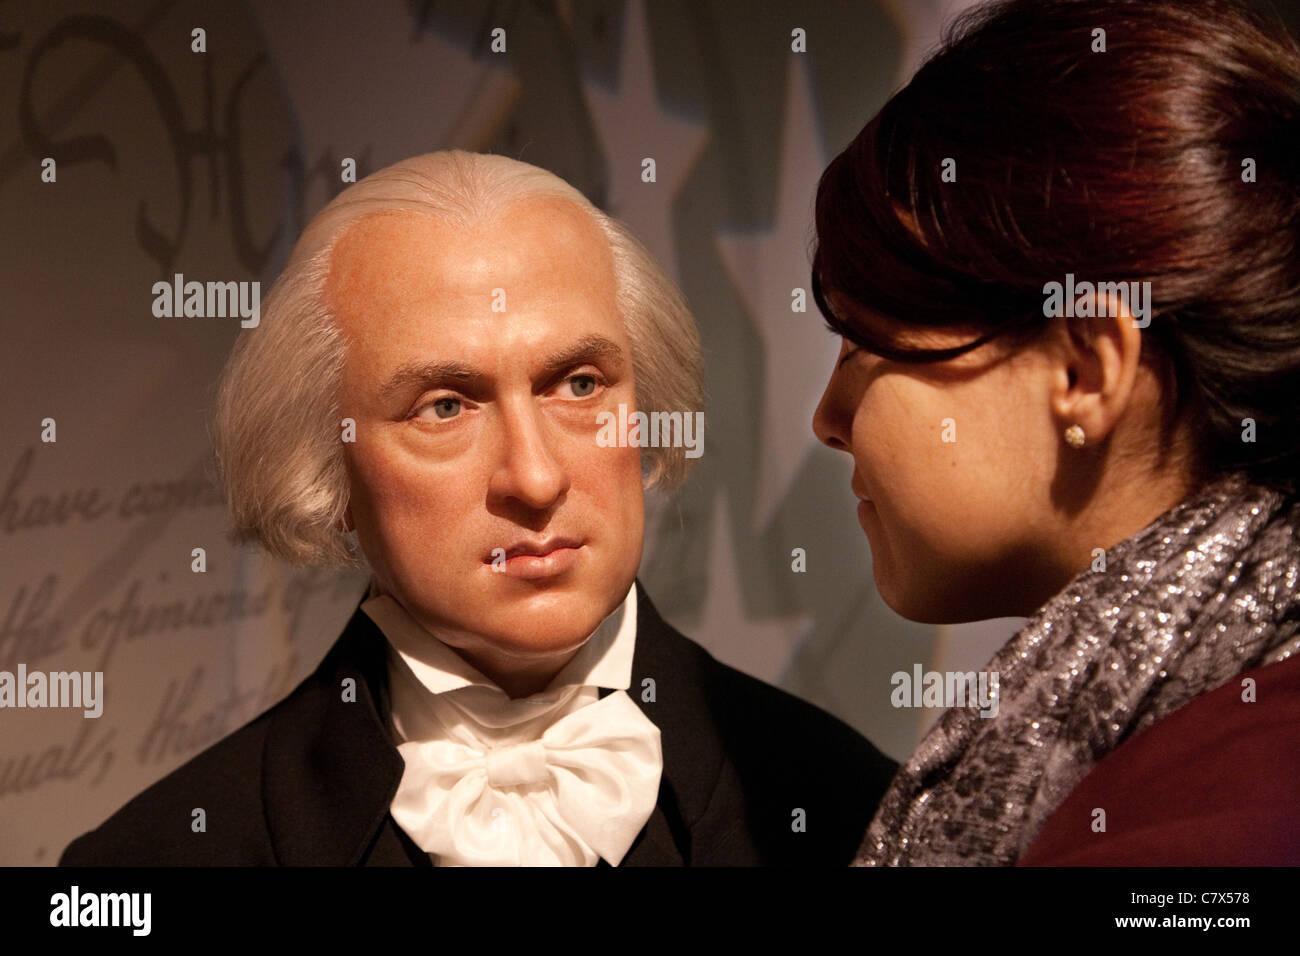 tourist with  waxwork of President George Washington at Madame Tussauds waxworks, Washington DC USA - Stock Image